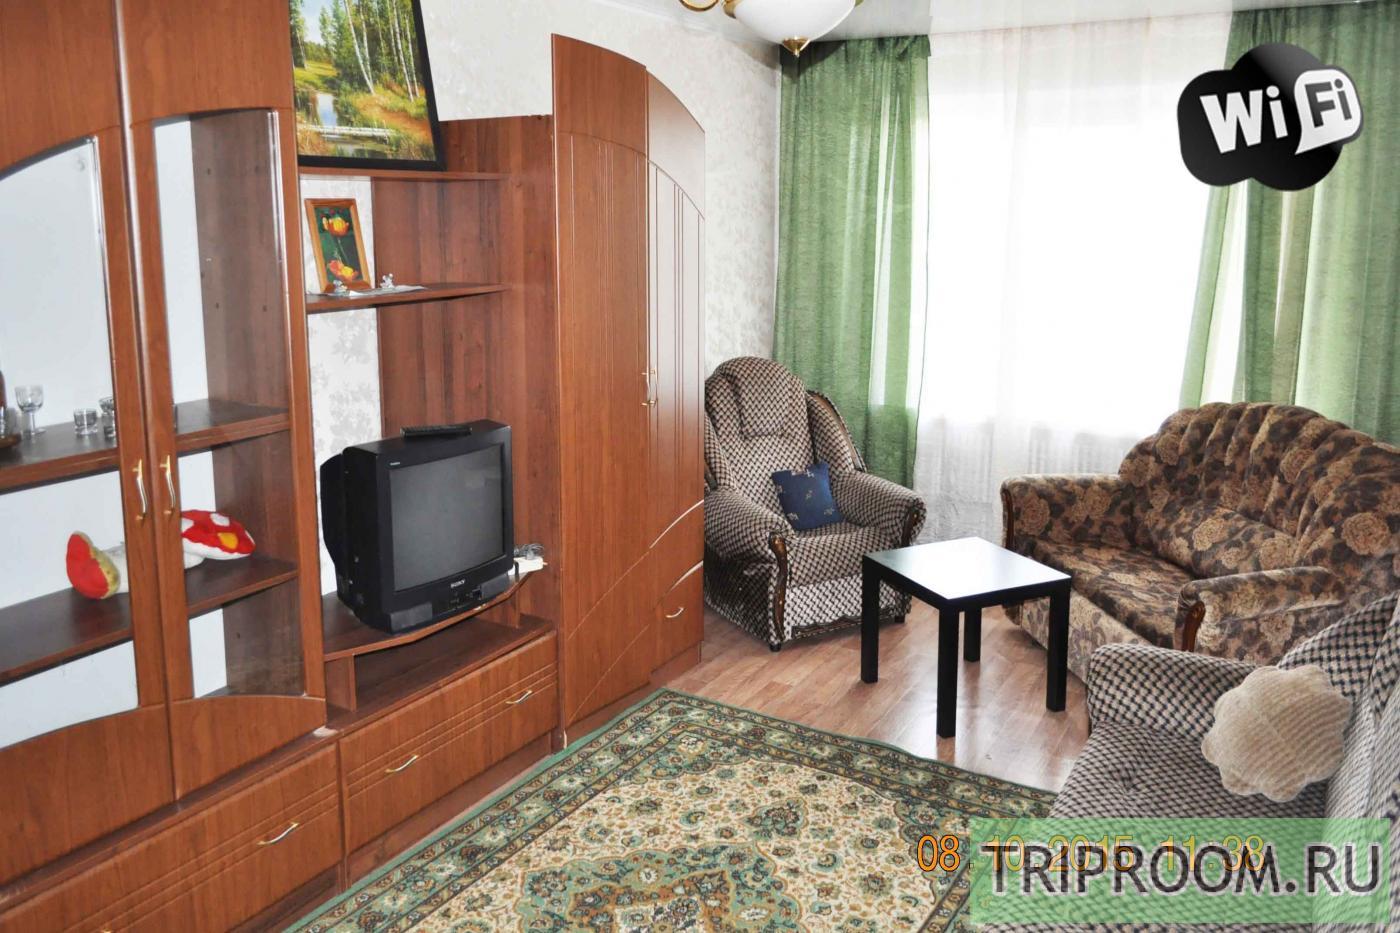 2-комнатная квартира посуточно (вариант № 11708), ул. Амосова улица, фото № 20